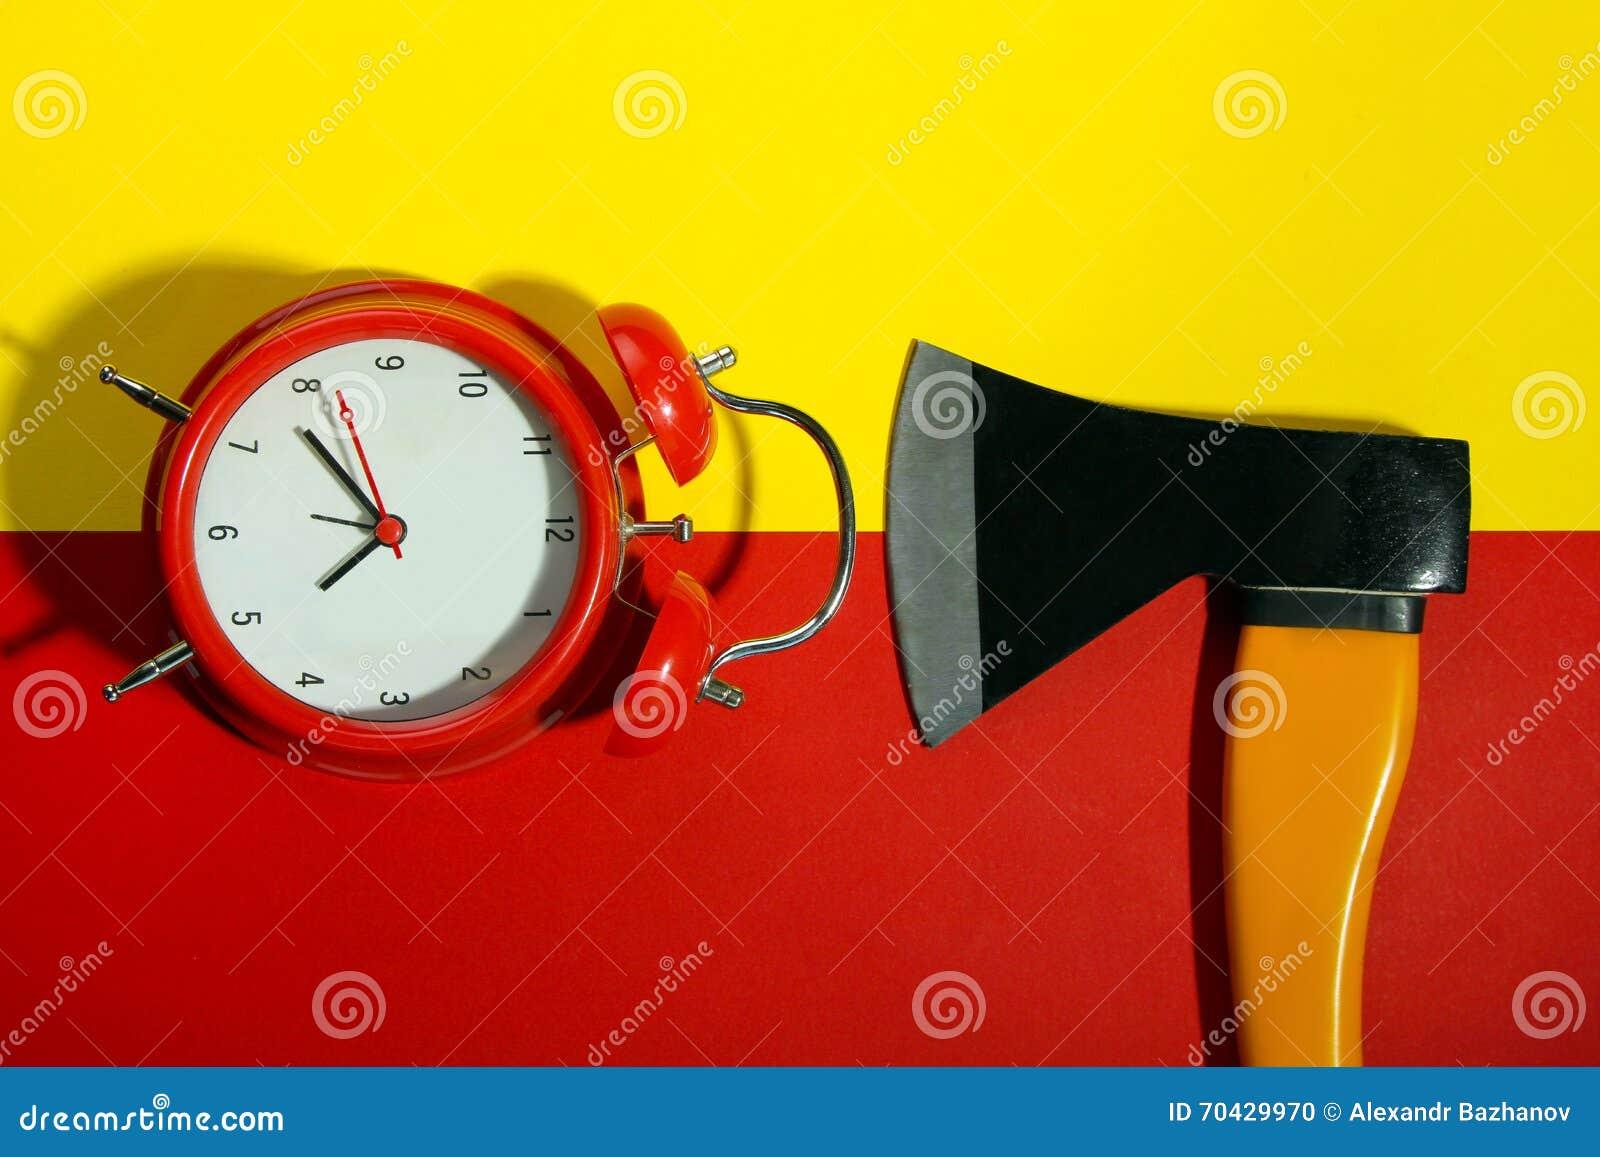 Axe with alarm clock